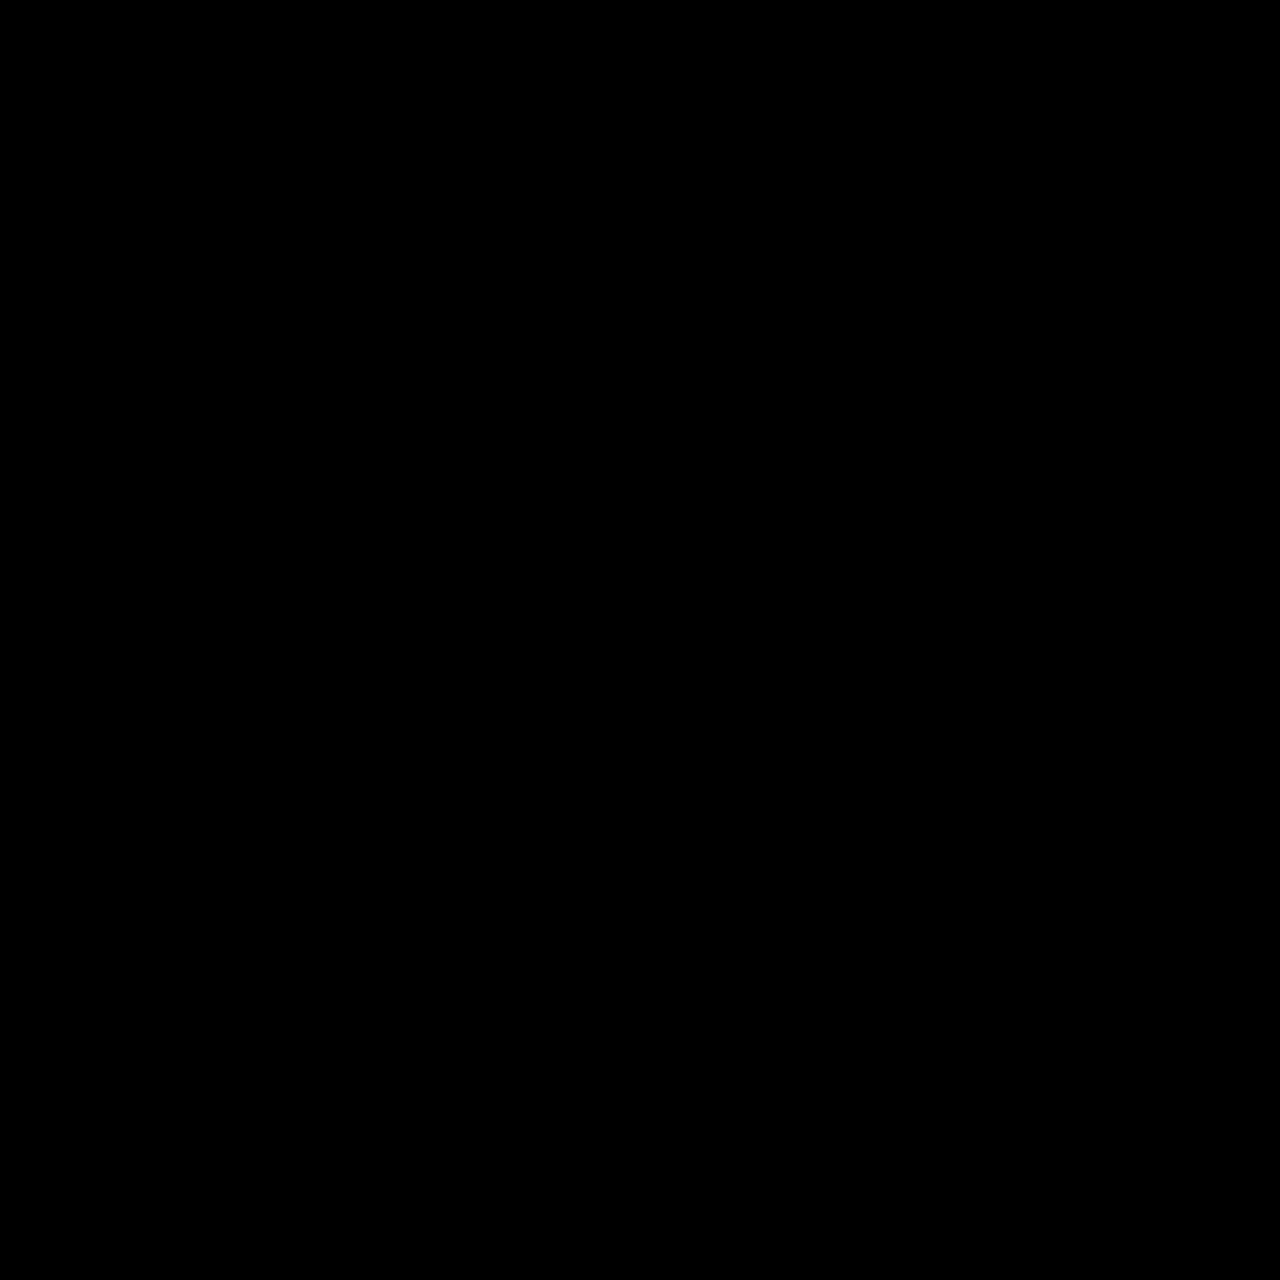 silhouette-3694249_1280